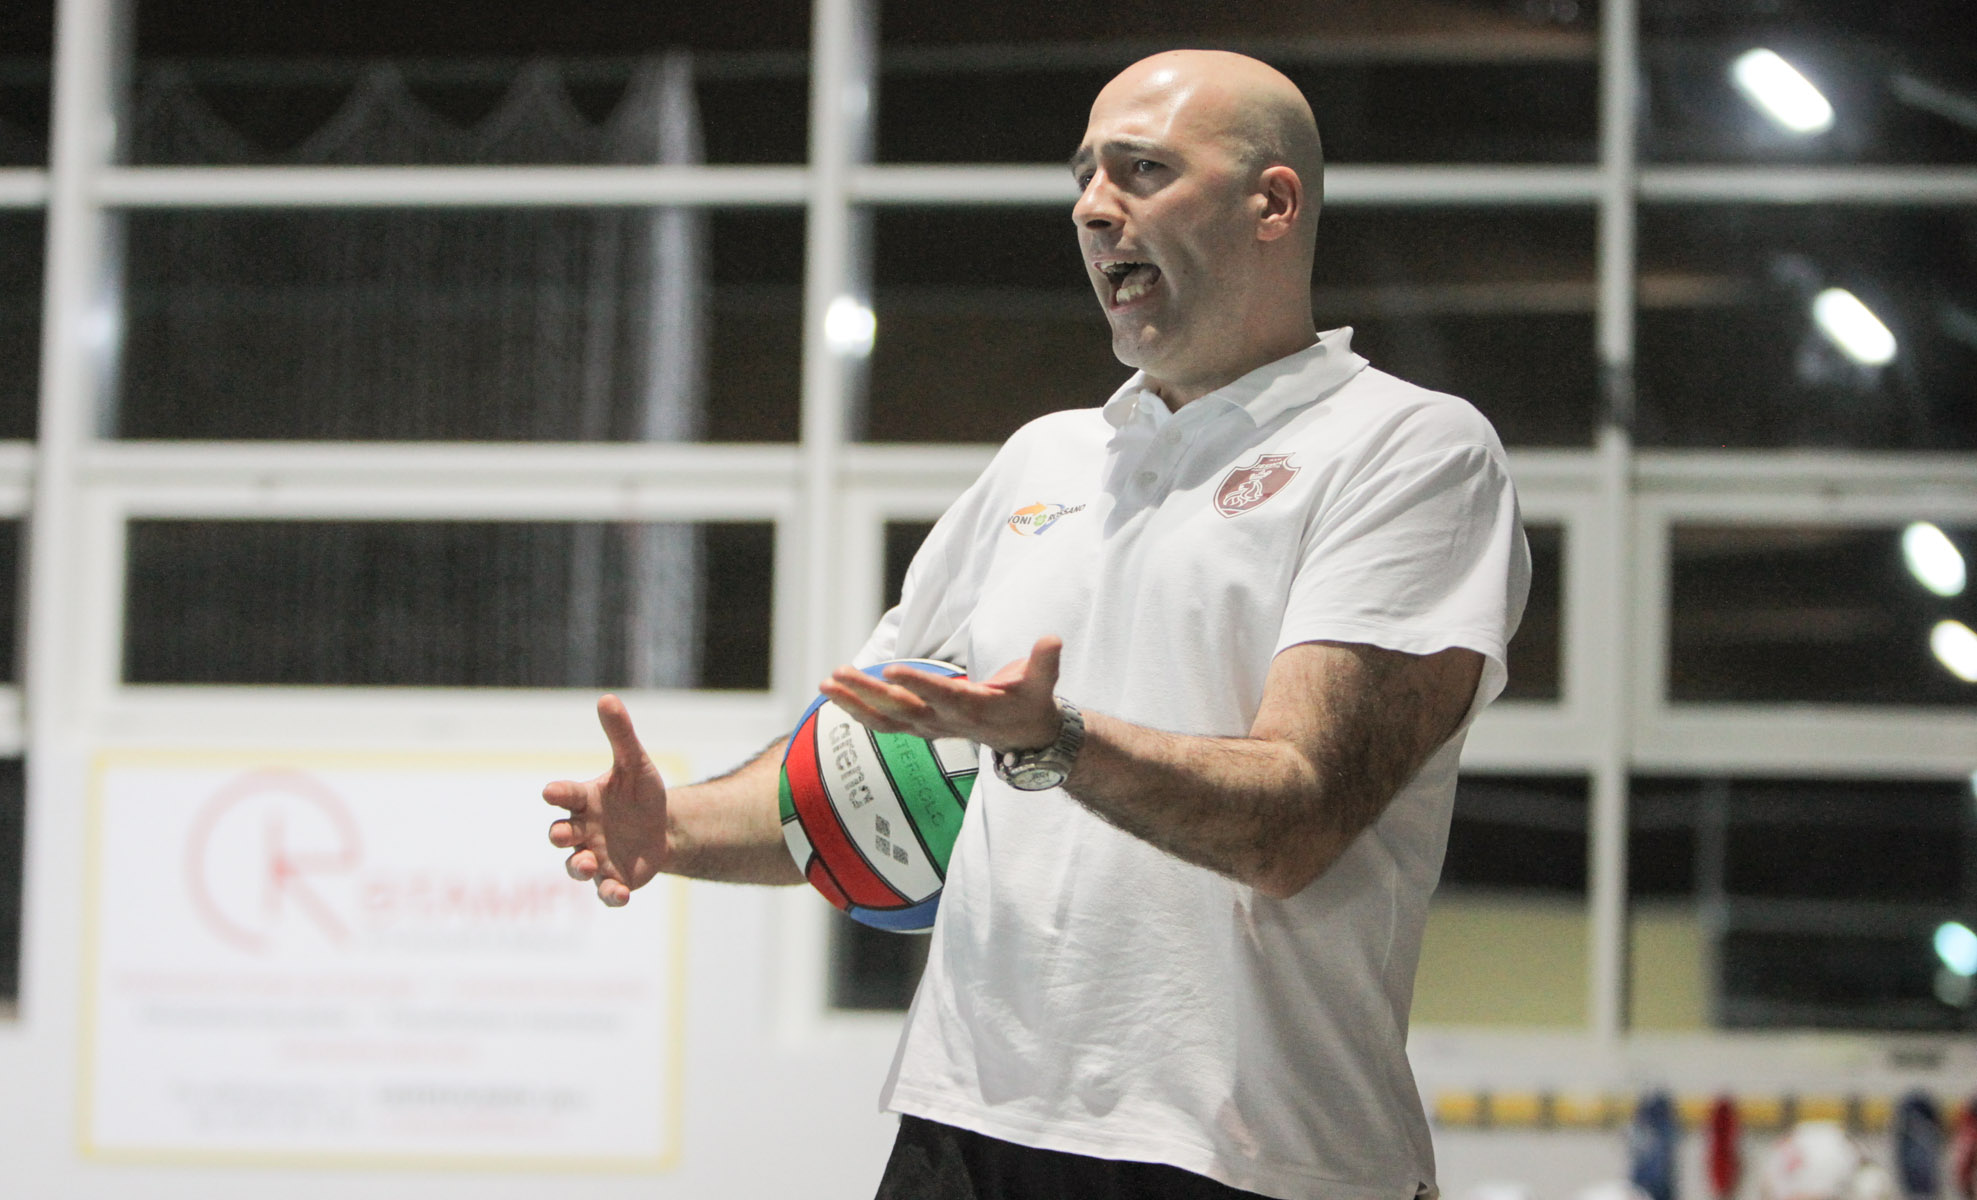 http://www.centropagina.it/wp-content/uploads/2017/03/Jesina-Pallanuoto-Pesaro-Giacomo-Iaricci-allenatore-Jesi-3.jpg